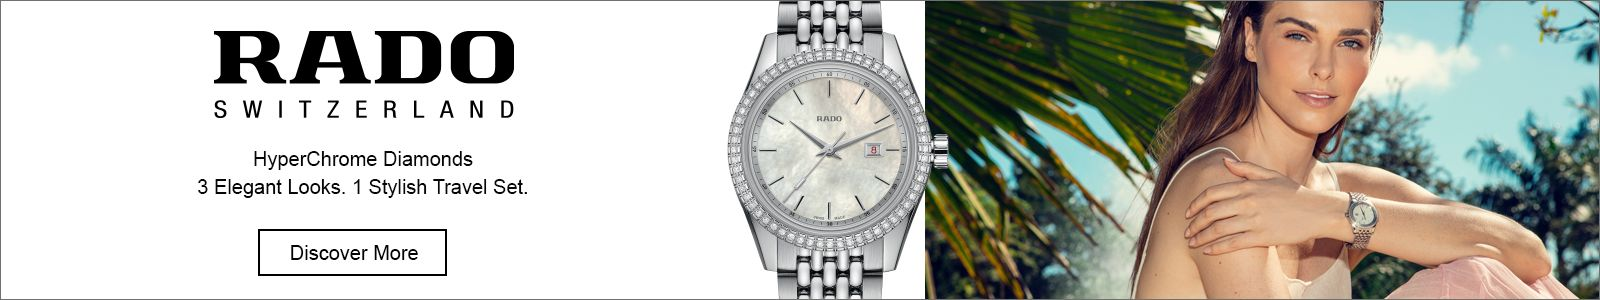 Rado, Switzerland, hyperchhrome Diamonds, 3 elegant Looks, 1 Stylish Travel set, Discover More